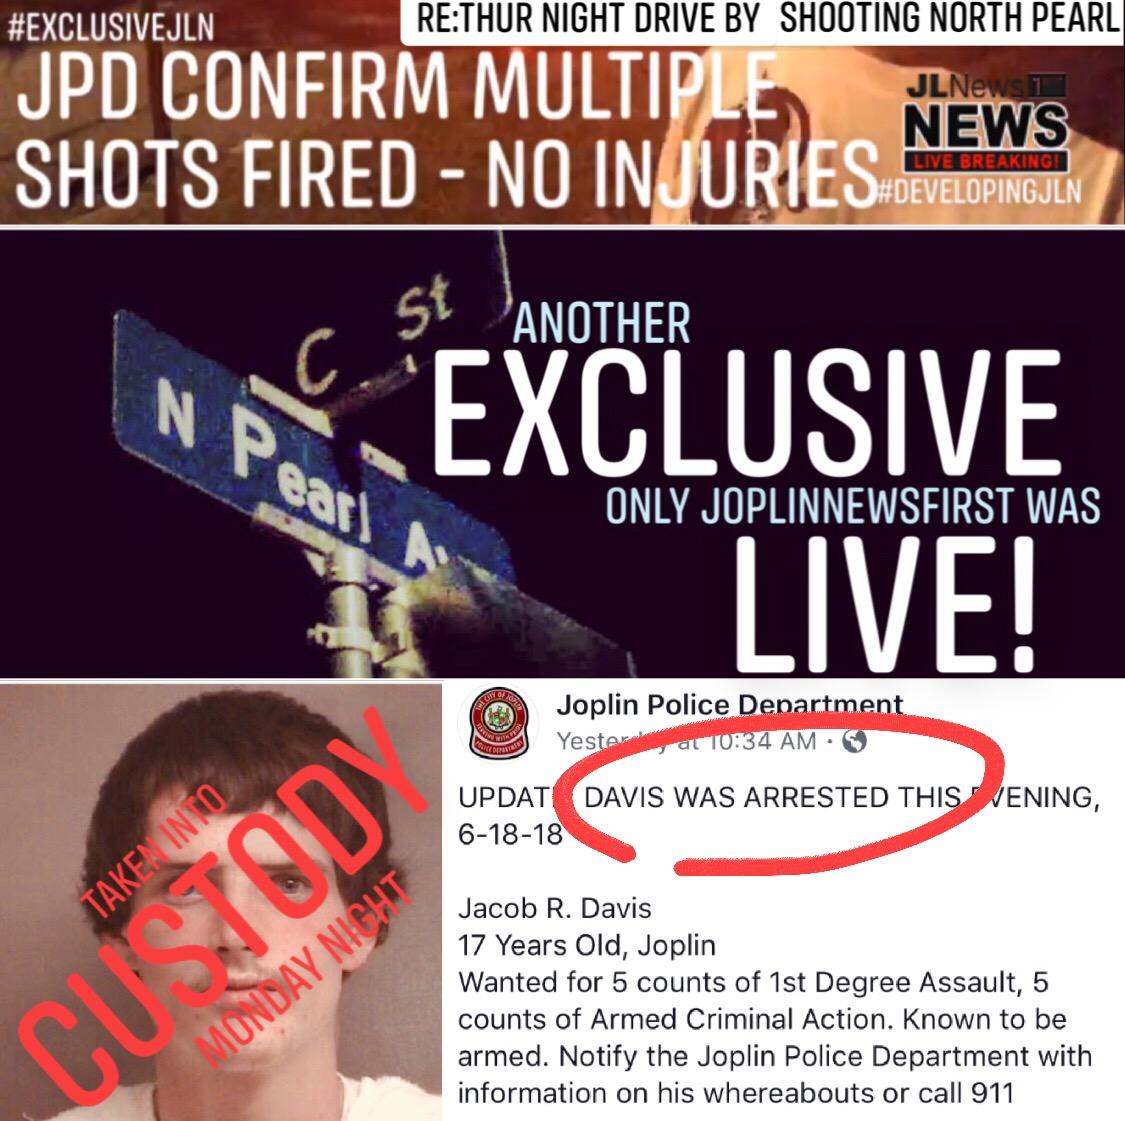 Joplin News First: UPDATE: DRIVE BY SHOOTING ON THUR